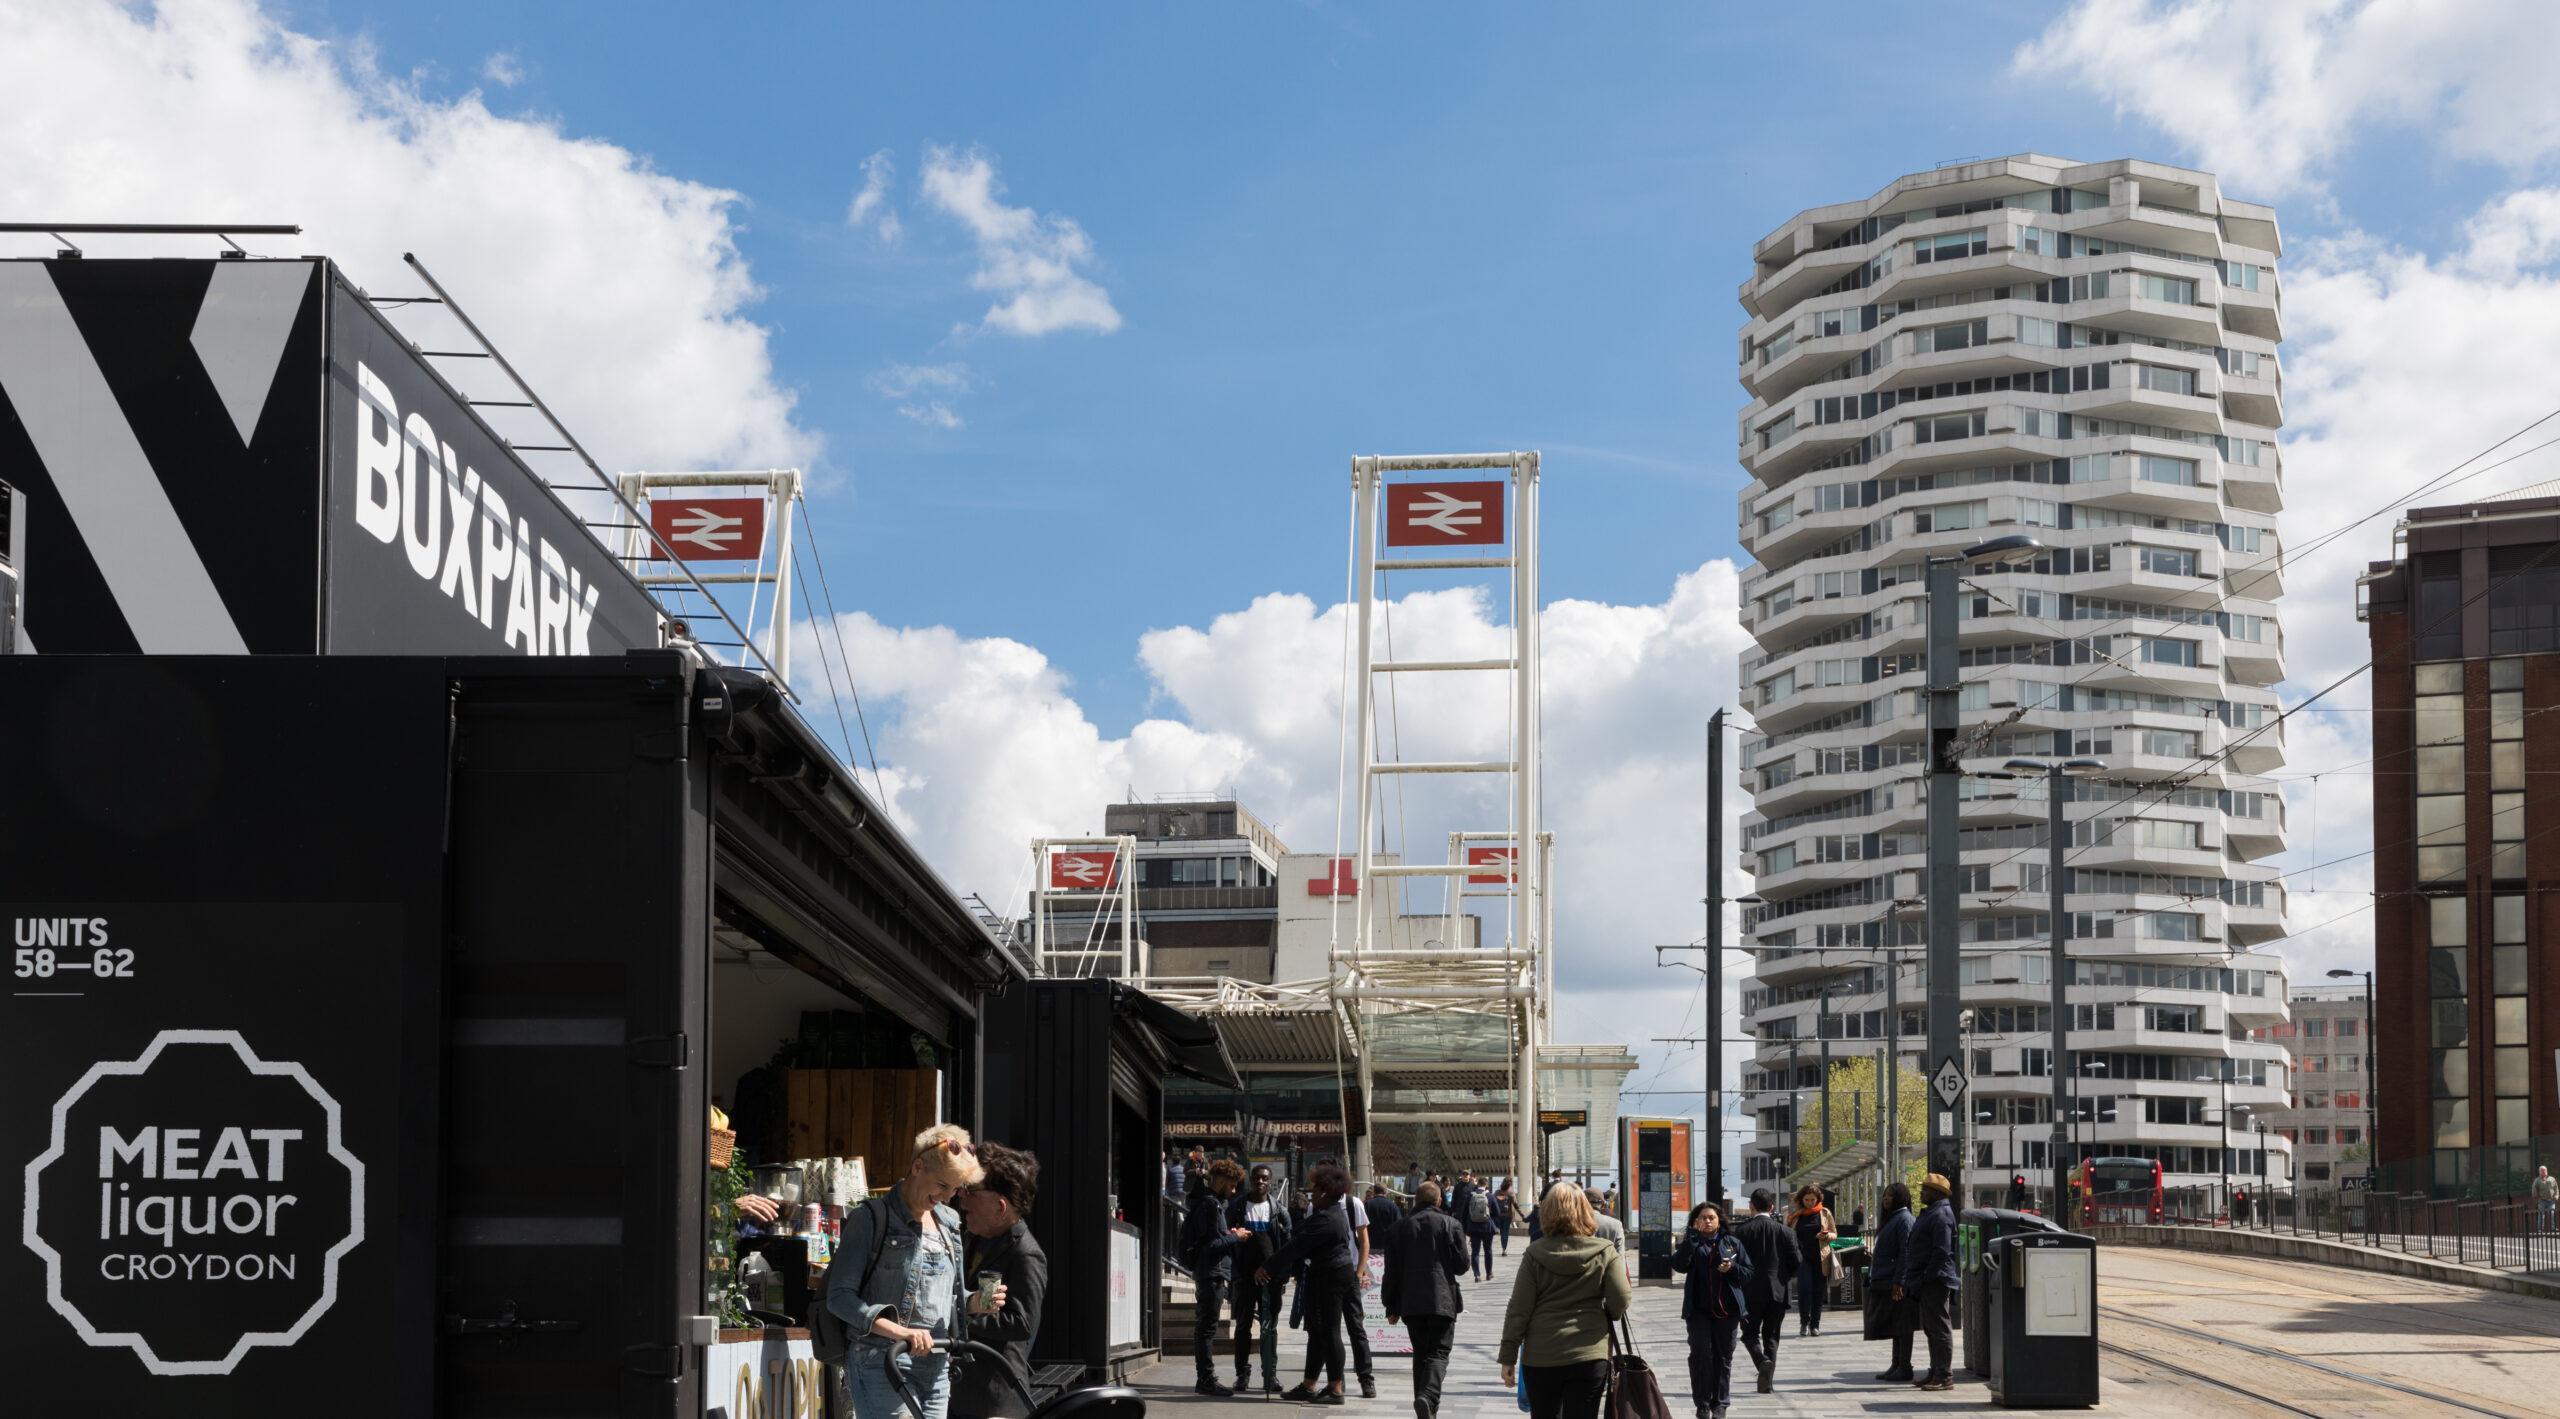 Croydon City Centre